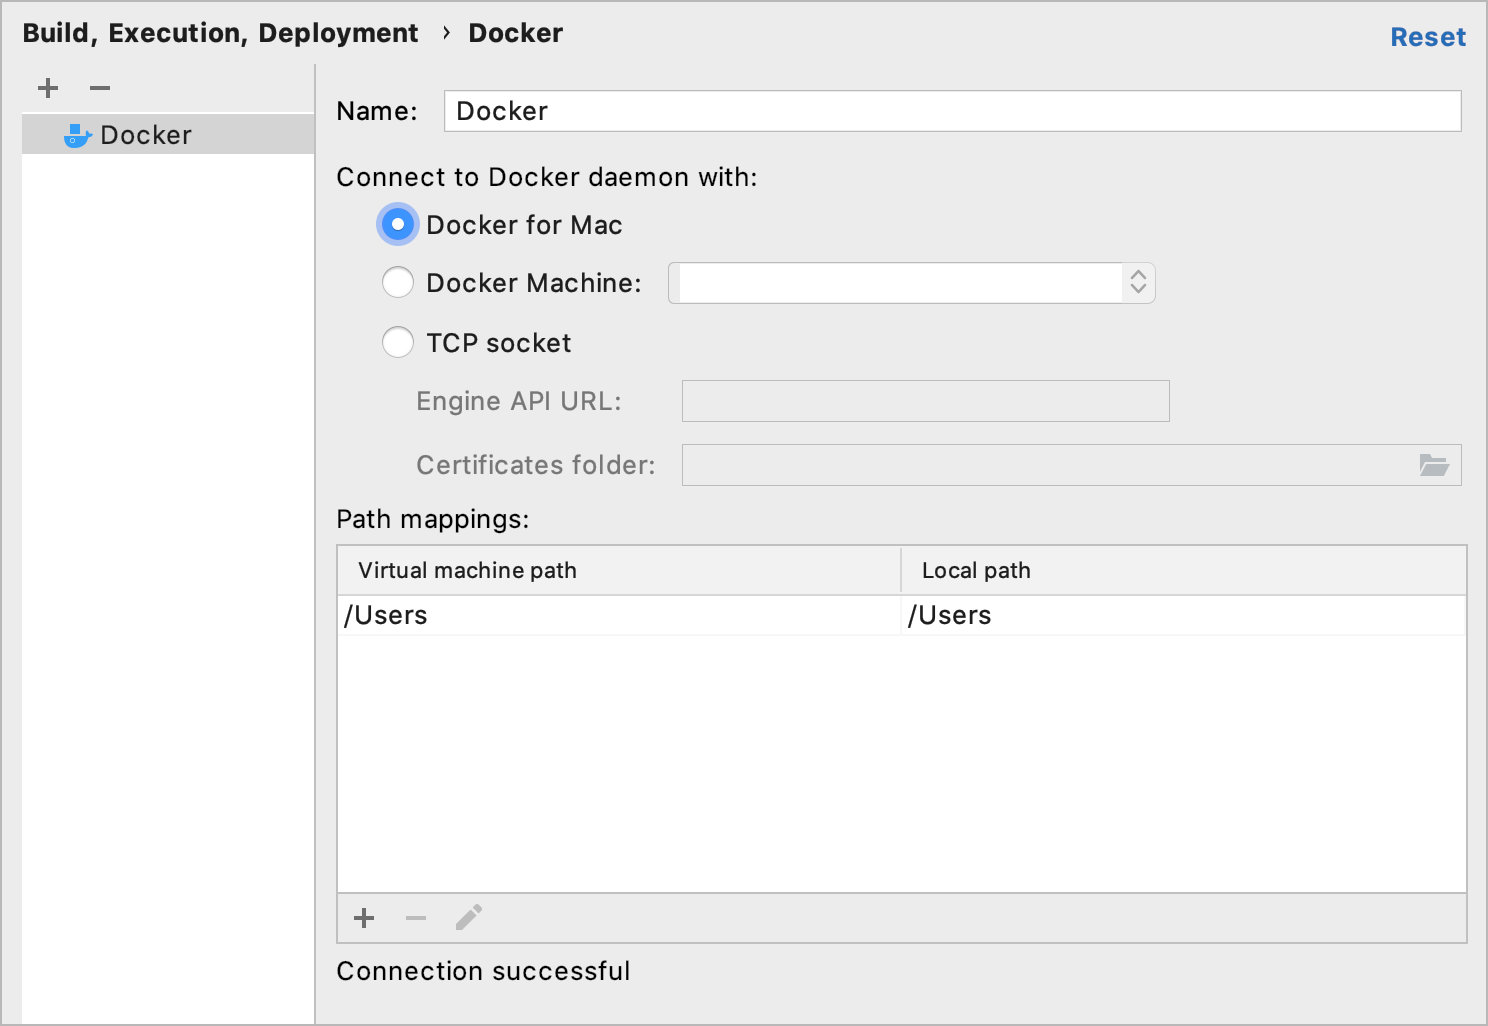 Docker connected